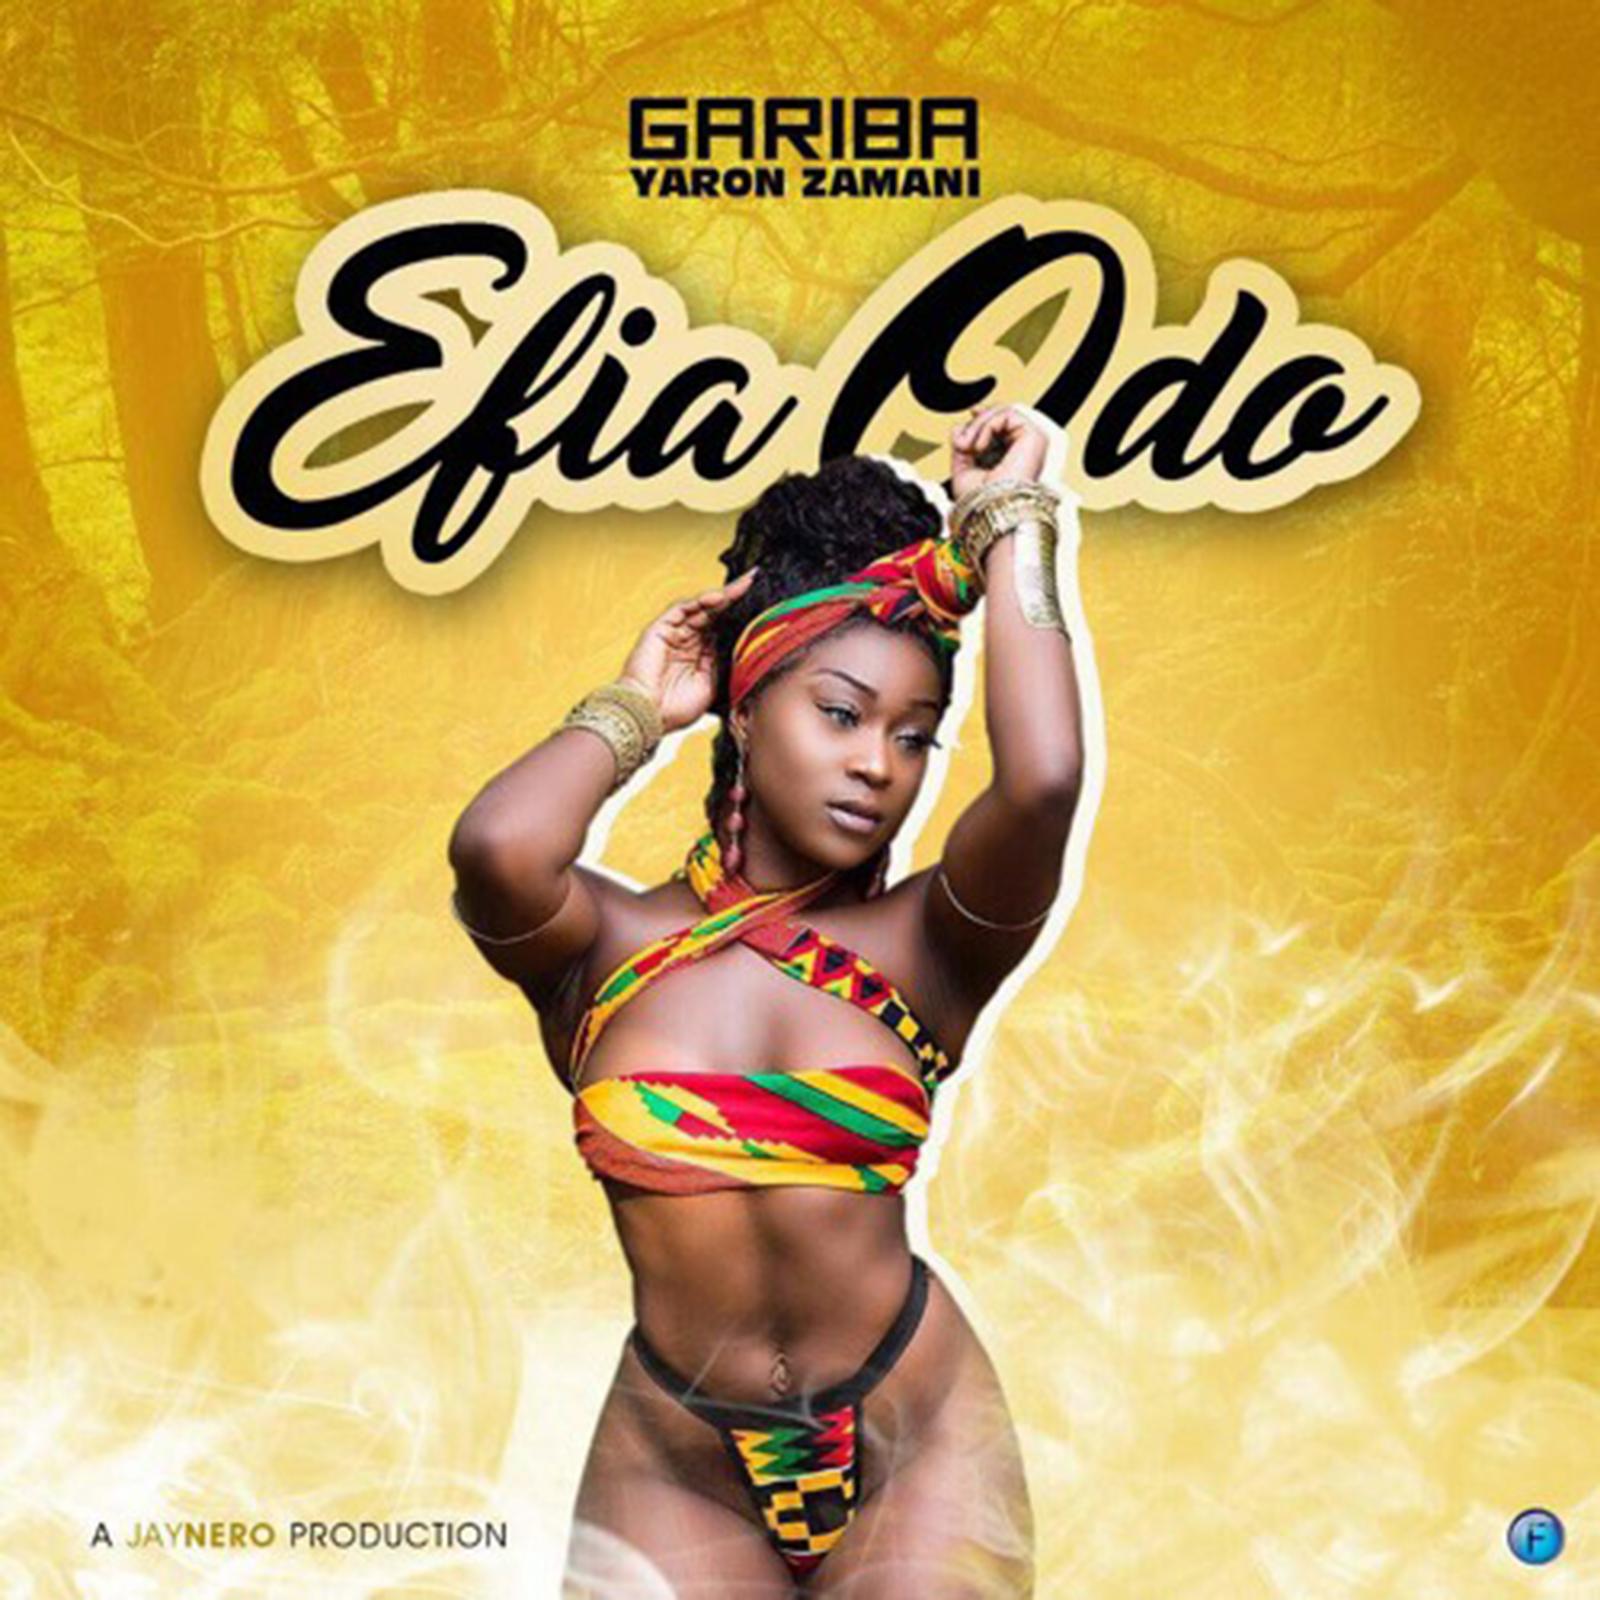 Efia Odo by Gariba